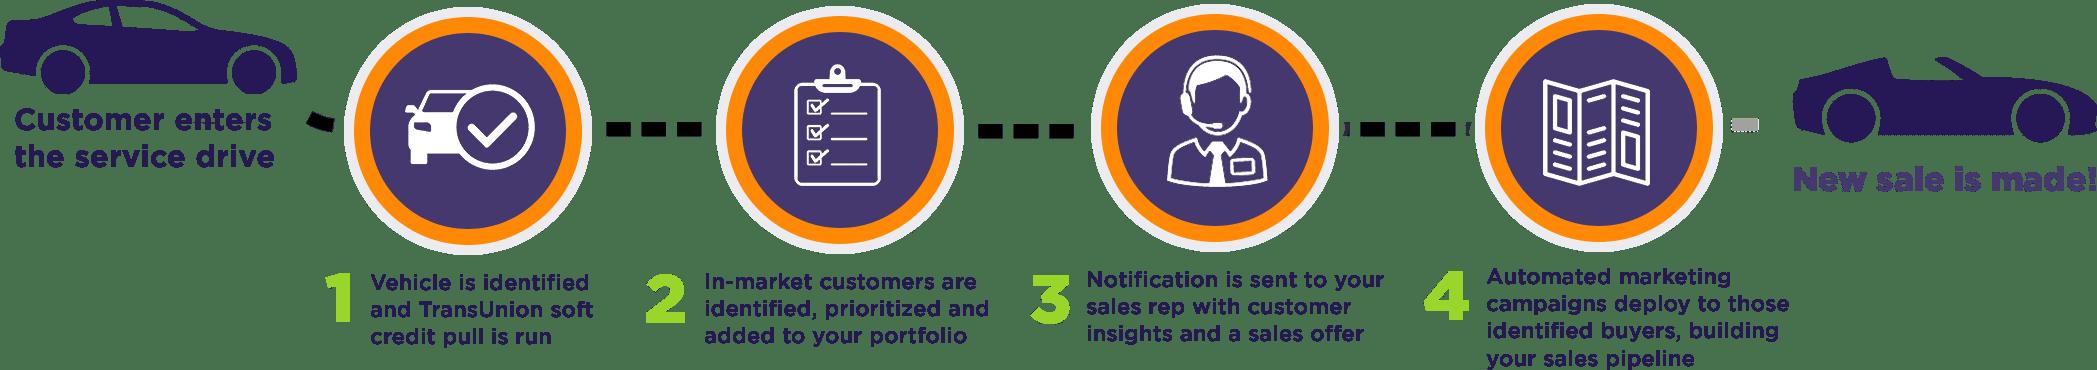 Market EyeQ Service Conquest Process